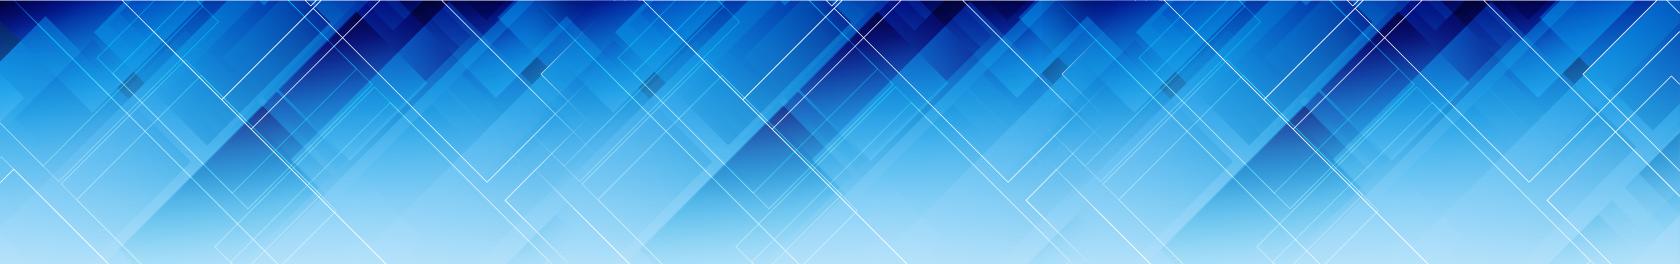 QPR Arkkitehtuuripankki-banner-image